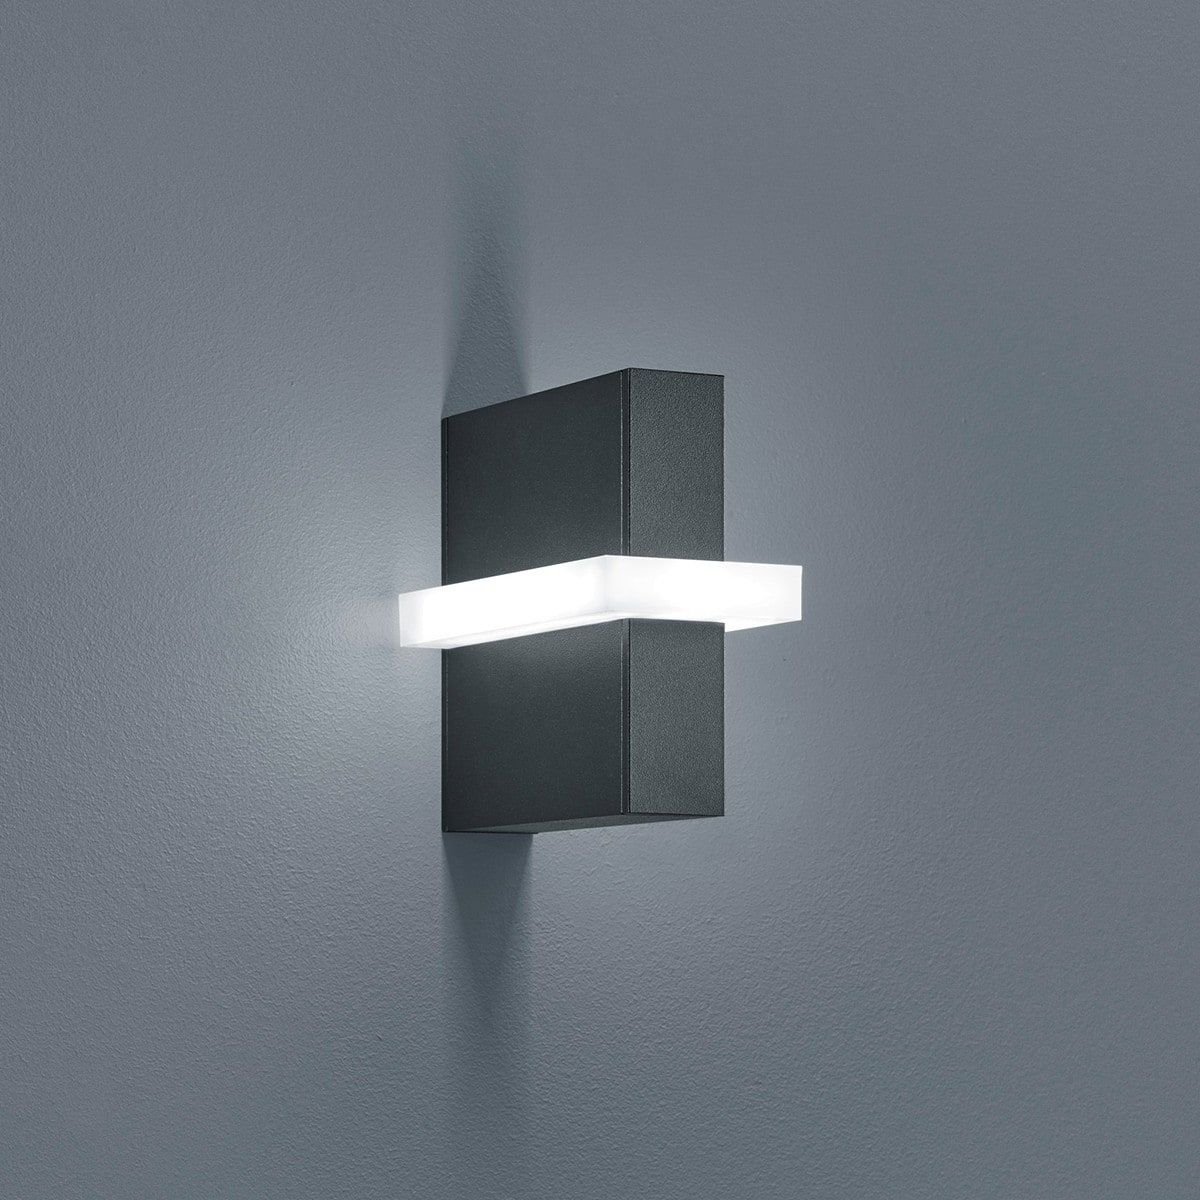 Aussenleuchten Wand Weiss Led Aussenlampe Batterie Lampe Fur Draussen Ohne Strom Aussenbeleuchtung Mit Bewegungsmelder Und Led Aussenwandleuchte Wandleuchte